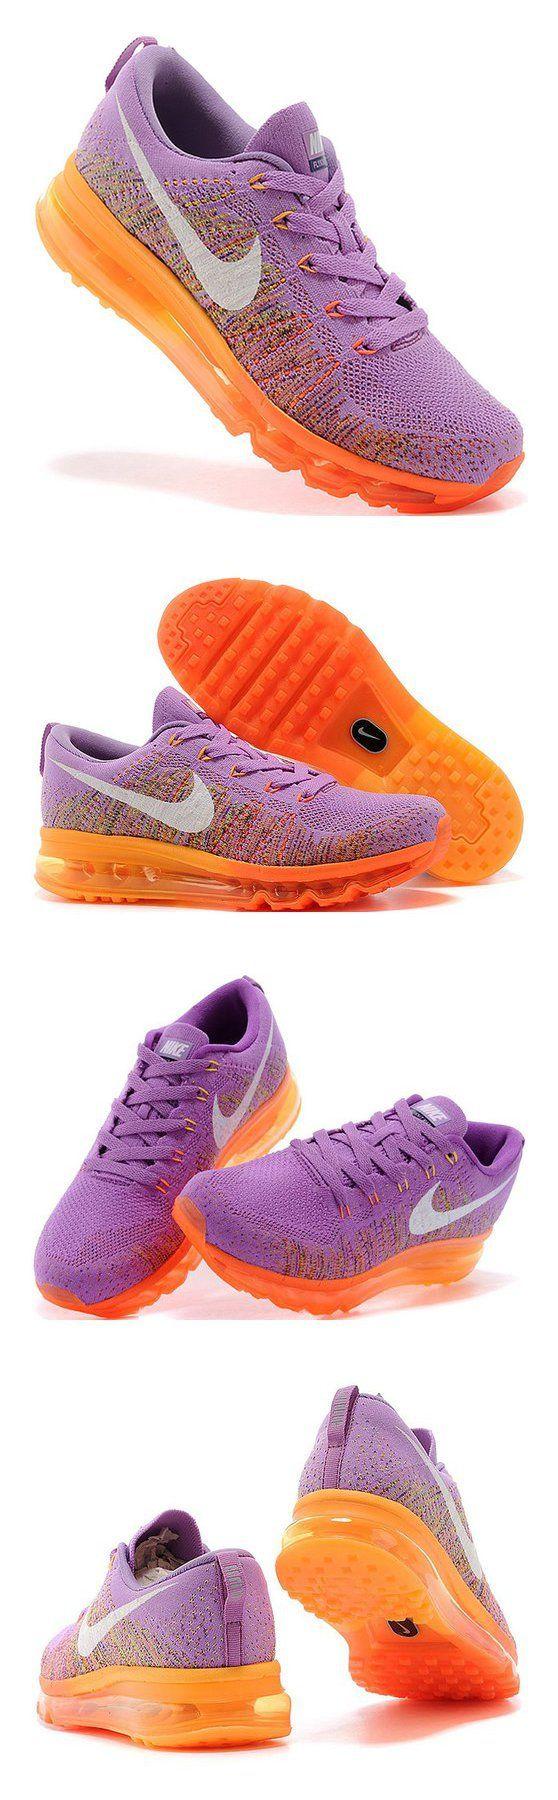 $168 - Women\u0027s Nike Flyknit Air Max Running Shoes Purple-Orange #shoes #nike